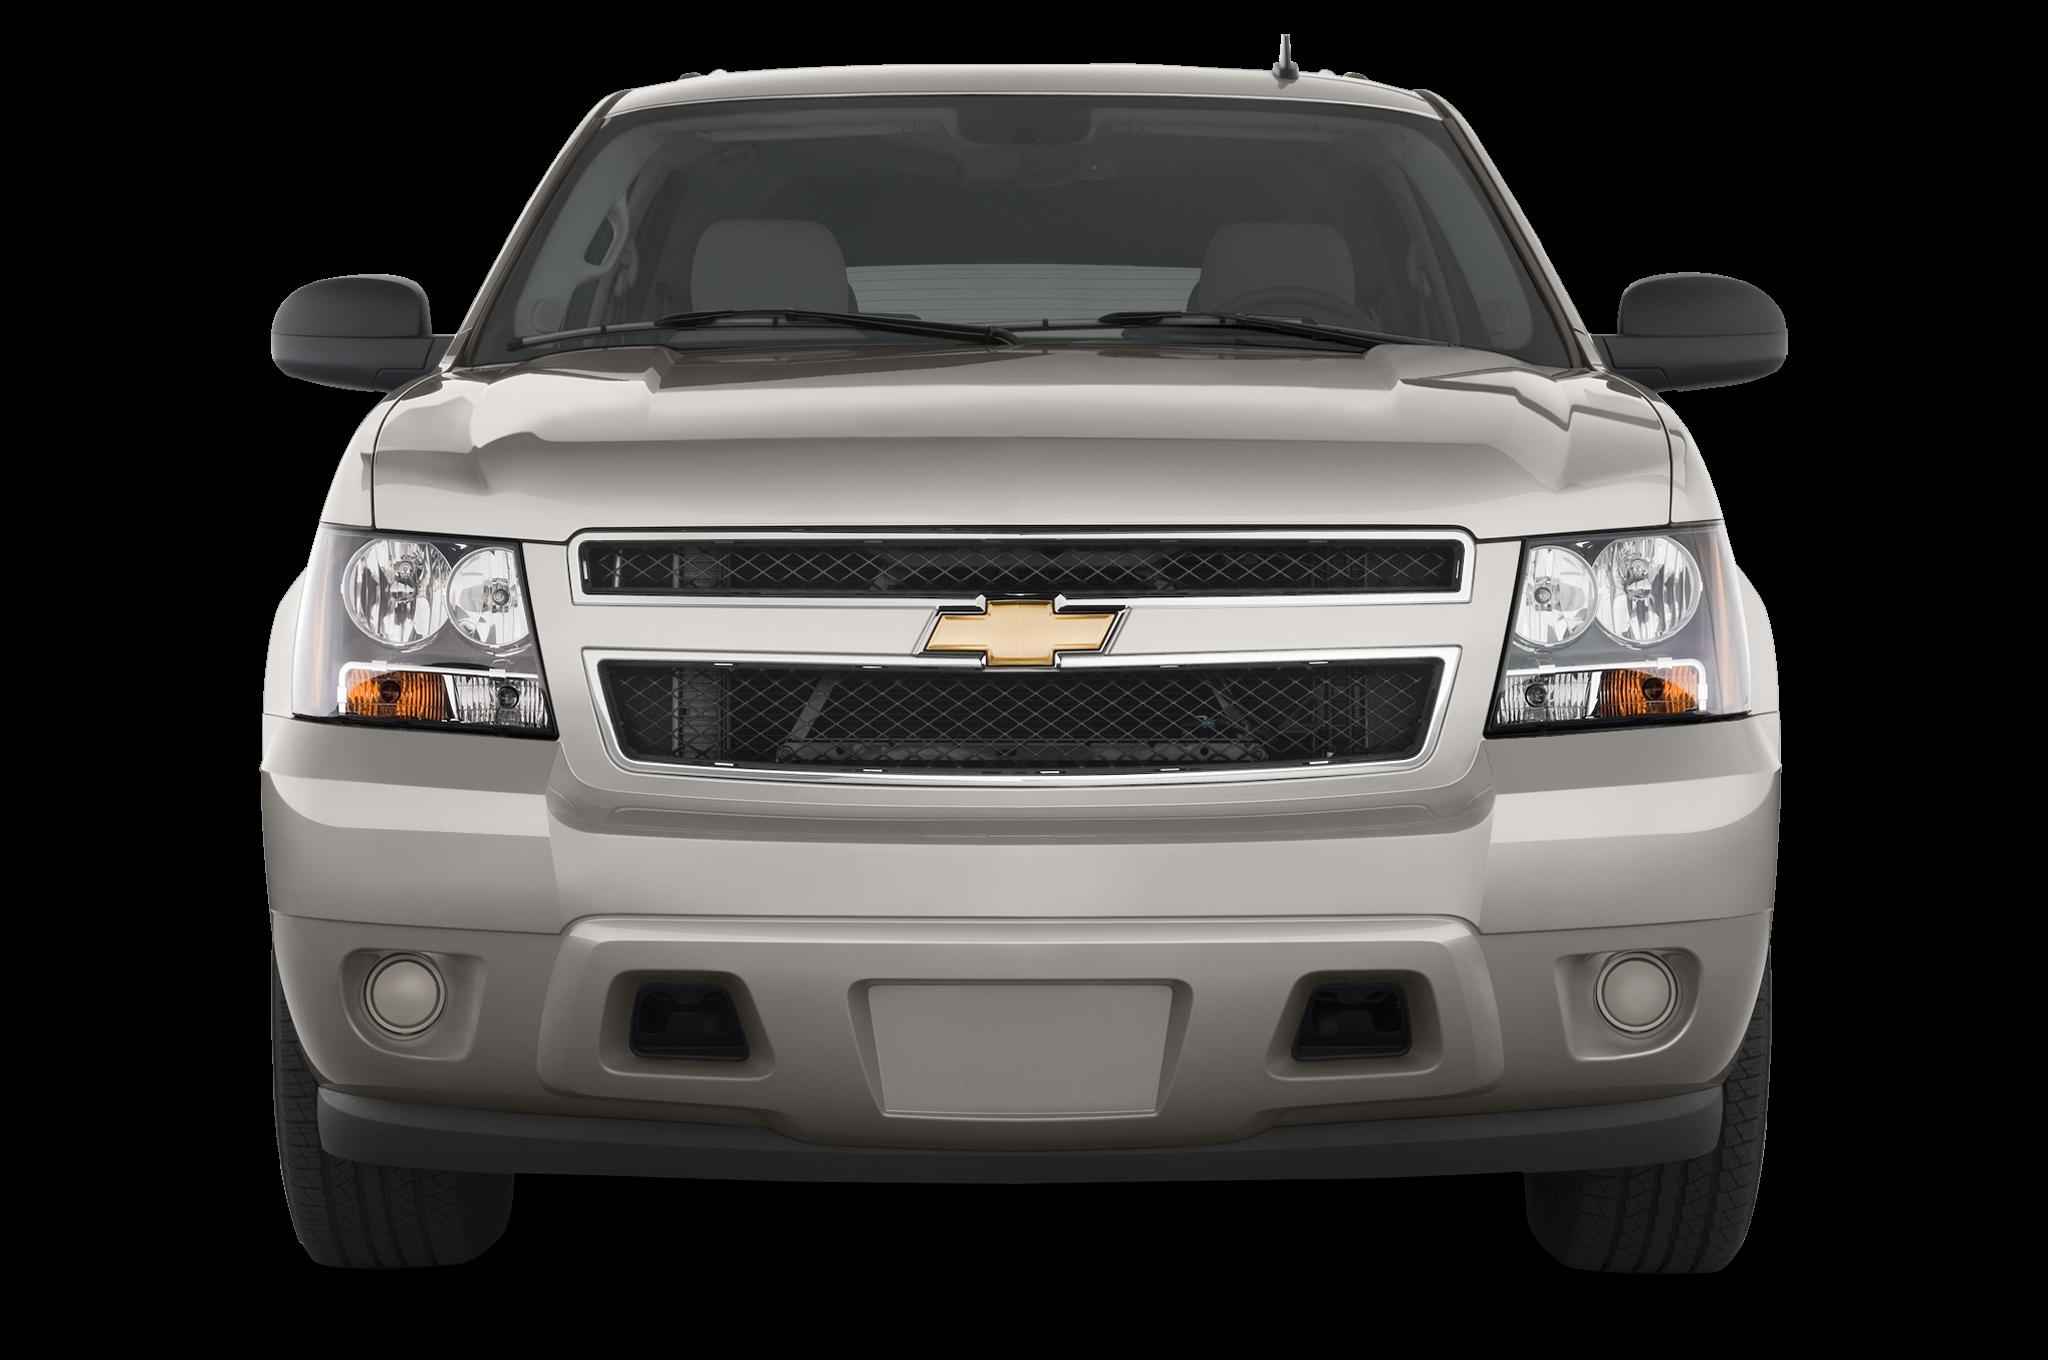 Chevrolet Suburban 2wd 1500 Lt 2012 International Price